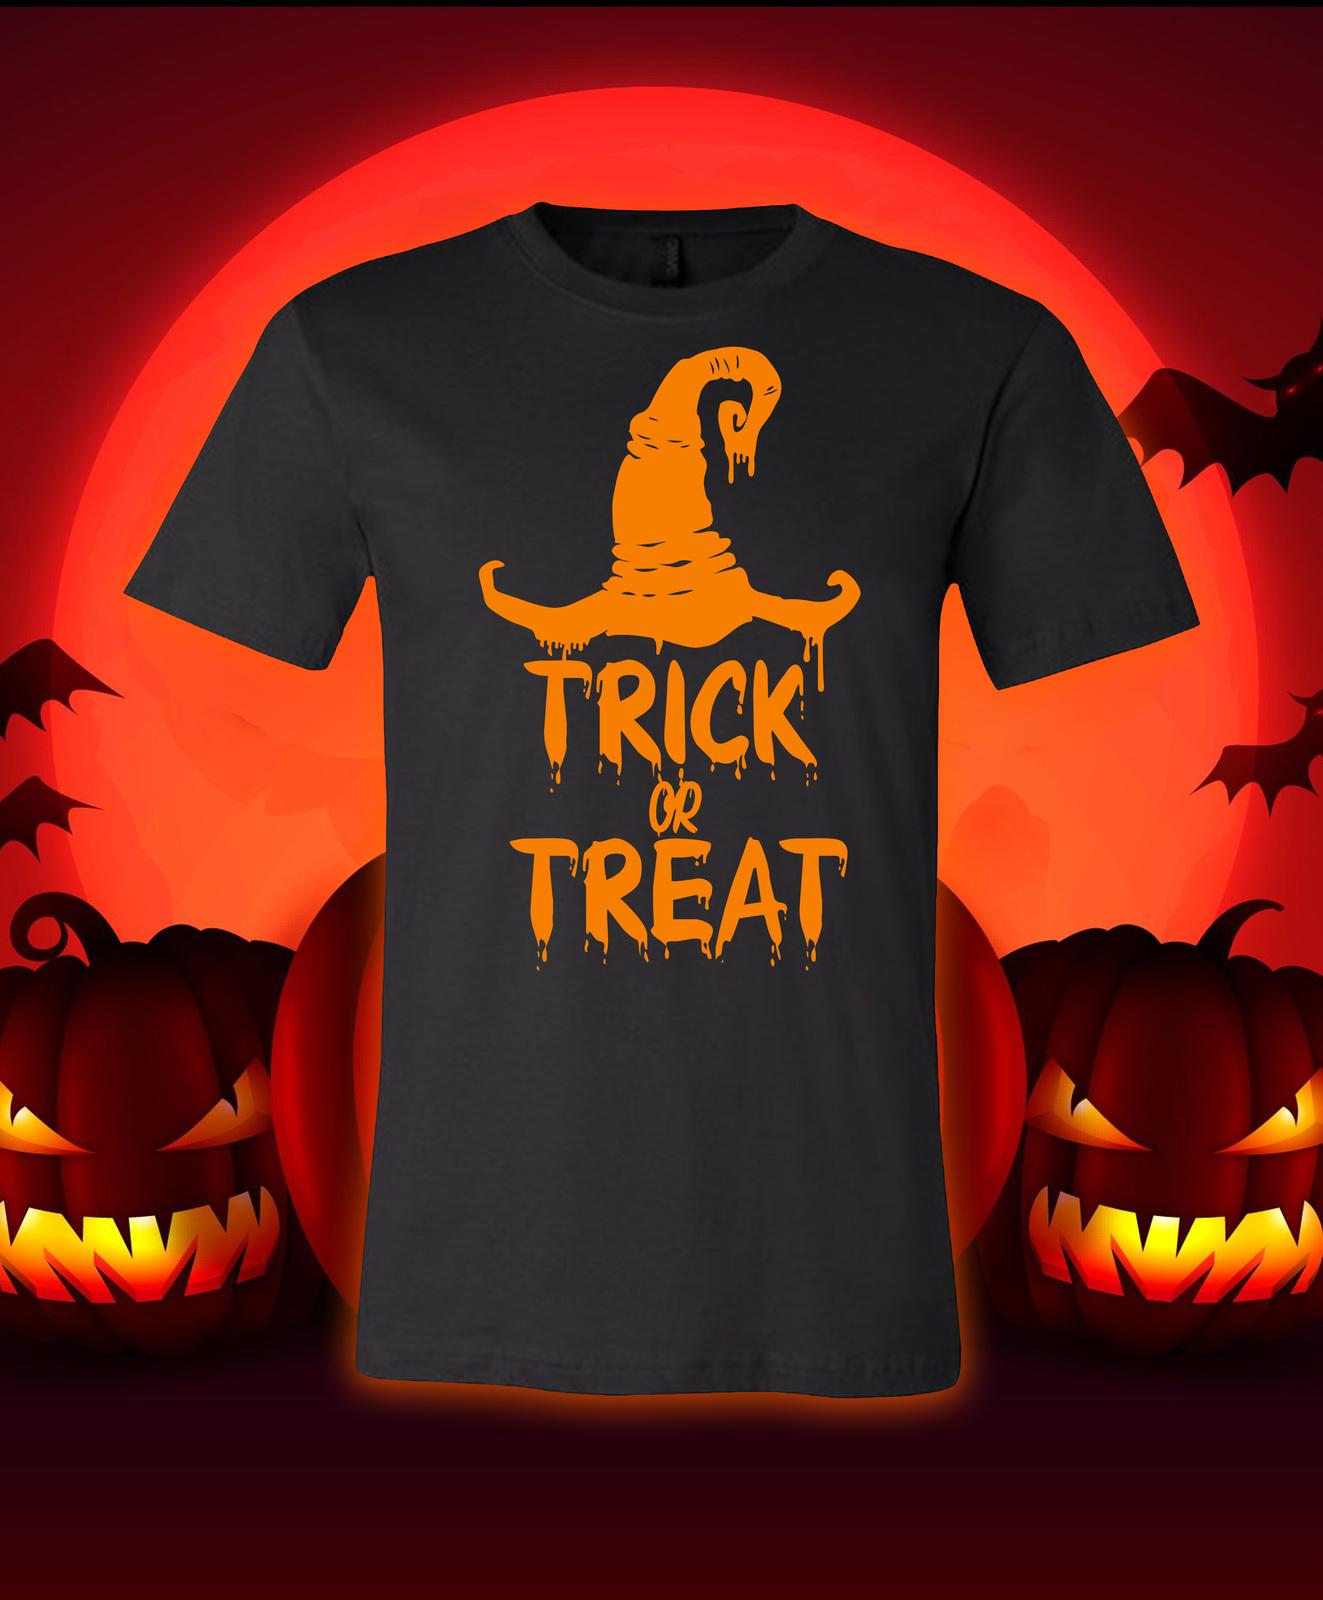 halloween shirt, trick or treat t shirt, Funny Halloween Costume unisex T-Shirt